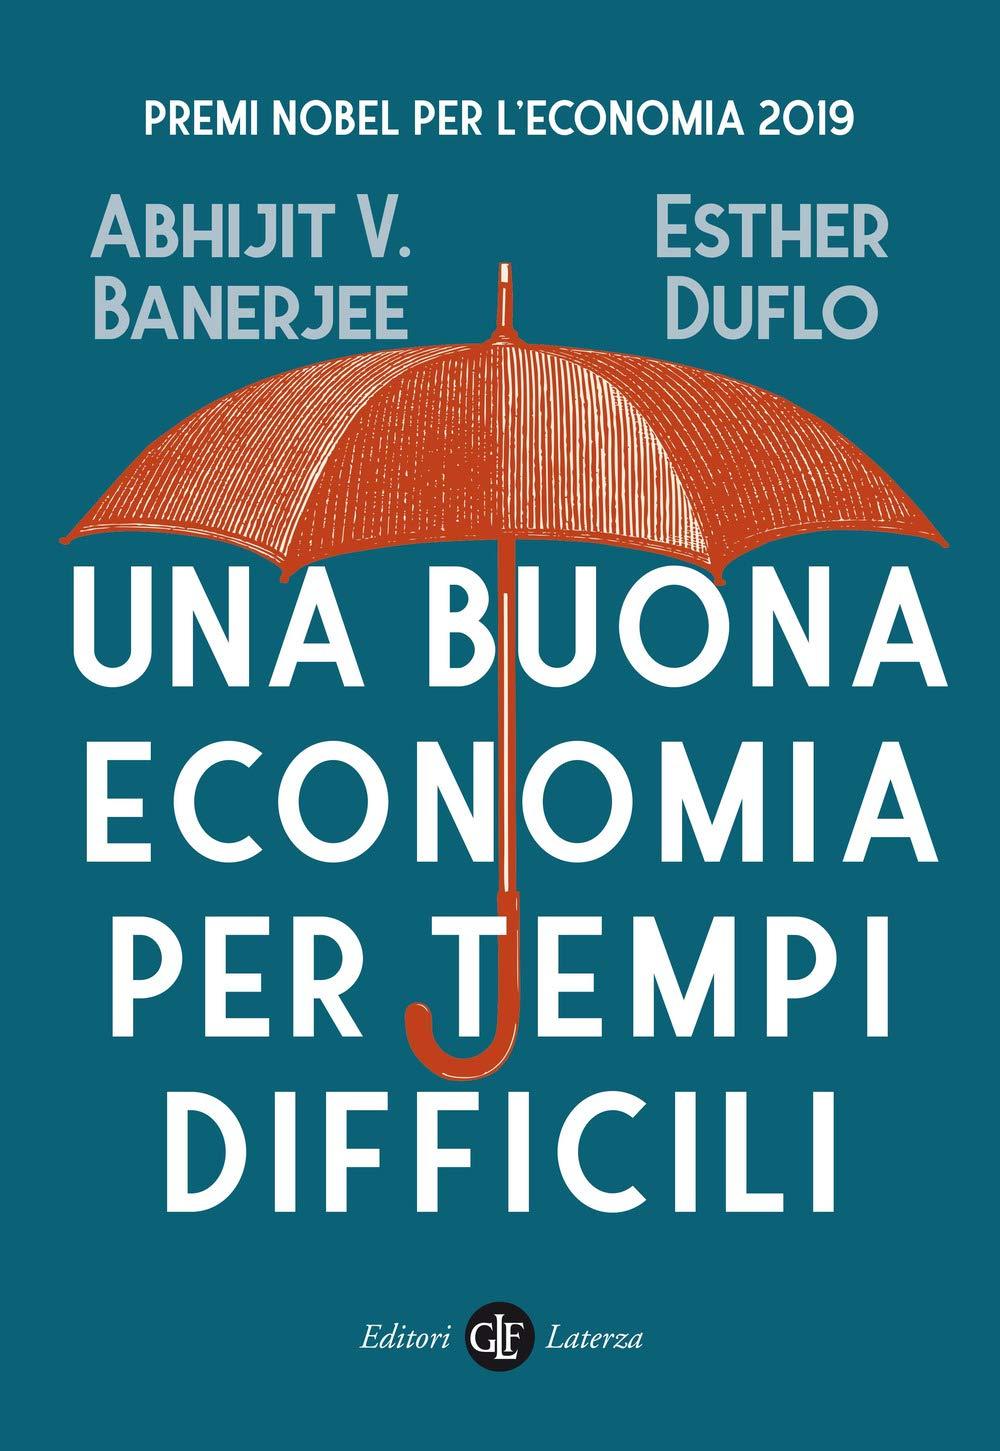 Una buona economia per tempi difficili : Banerjee, Abhijit Vinayak, Duflo,  Esther: Amazon.it: Libri